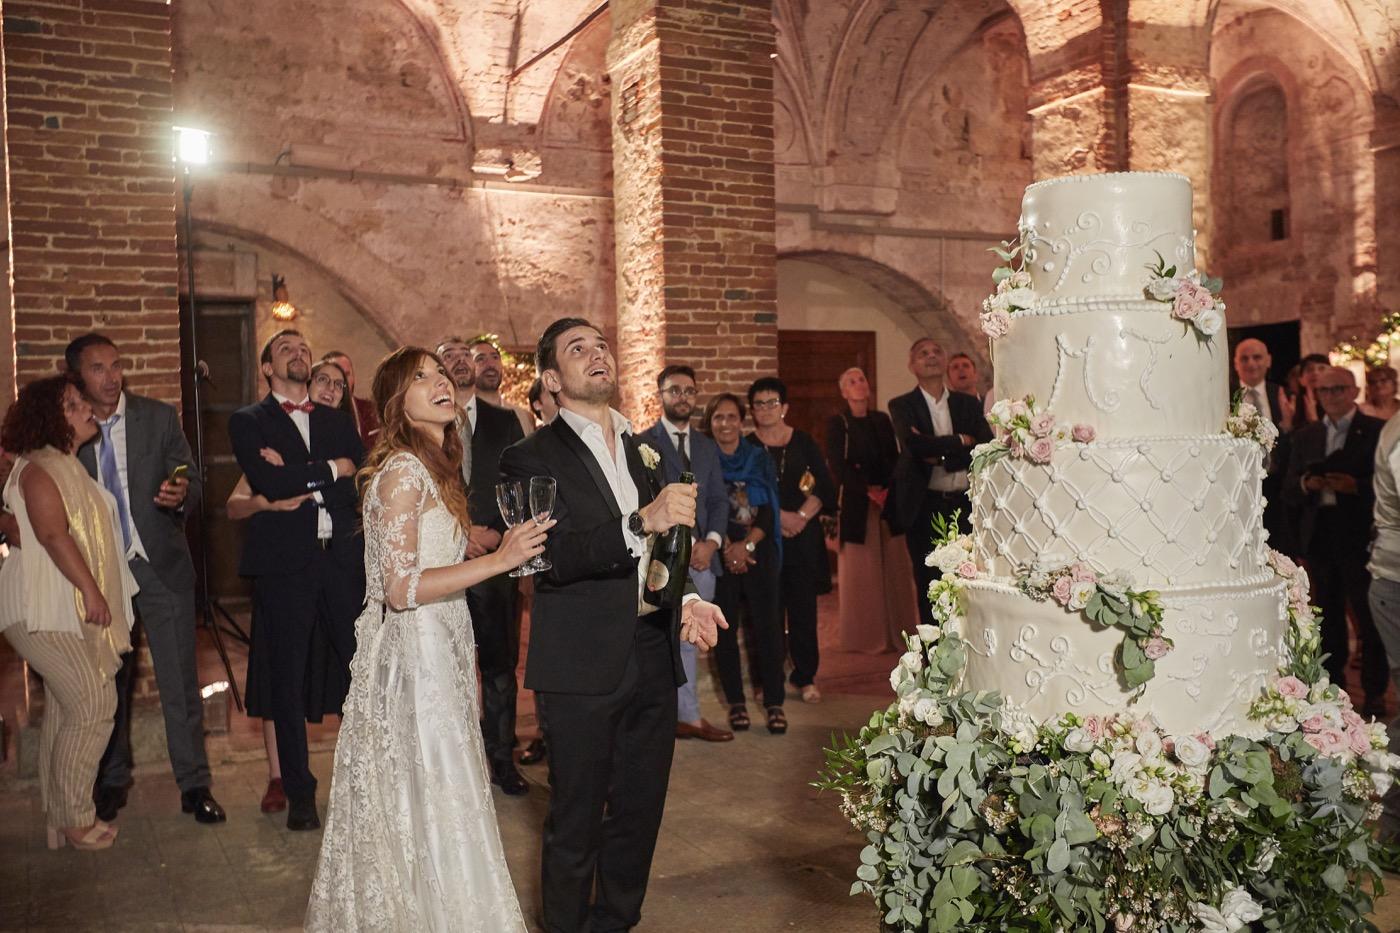 Claudio-Coppola-wedding-photographer-abbazia-7-frati-piegaro-88